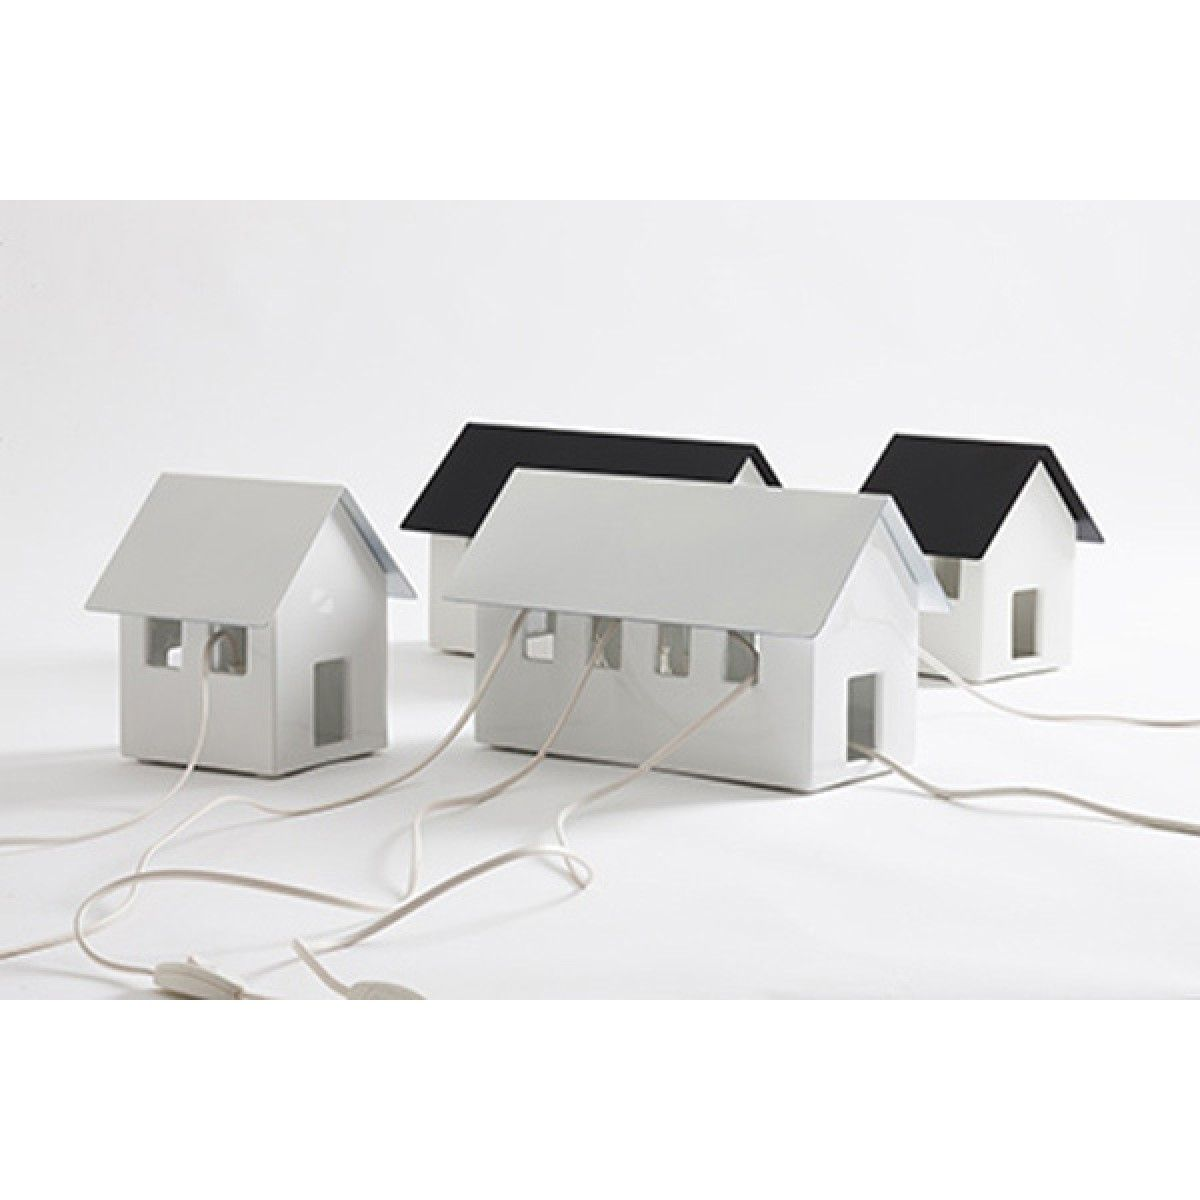 Boite Cache Prise Electrique maison cache prise électrique bosa | maison cachée, maison